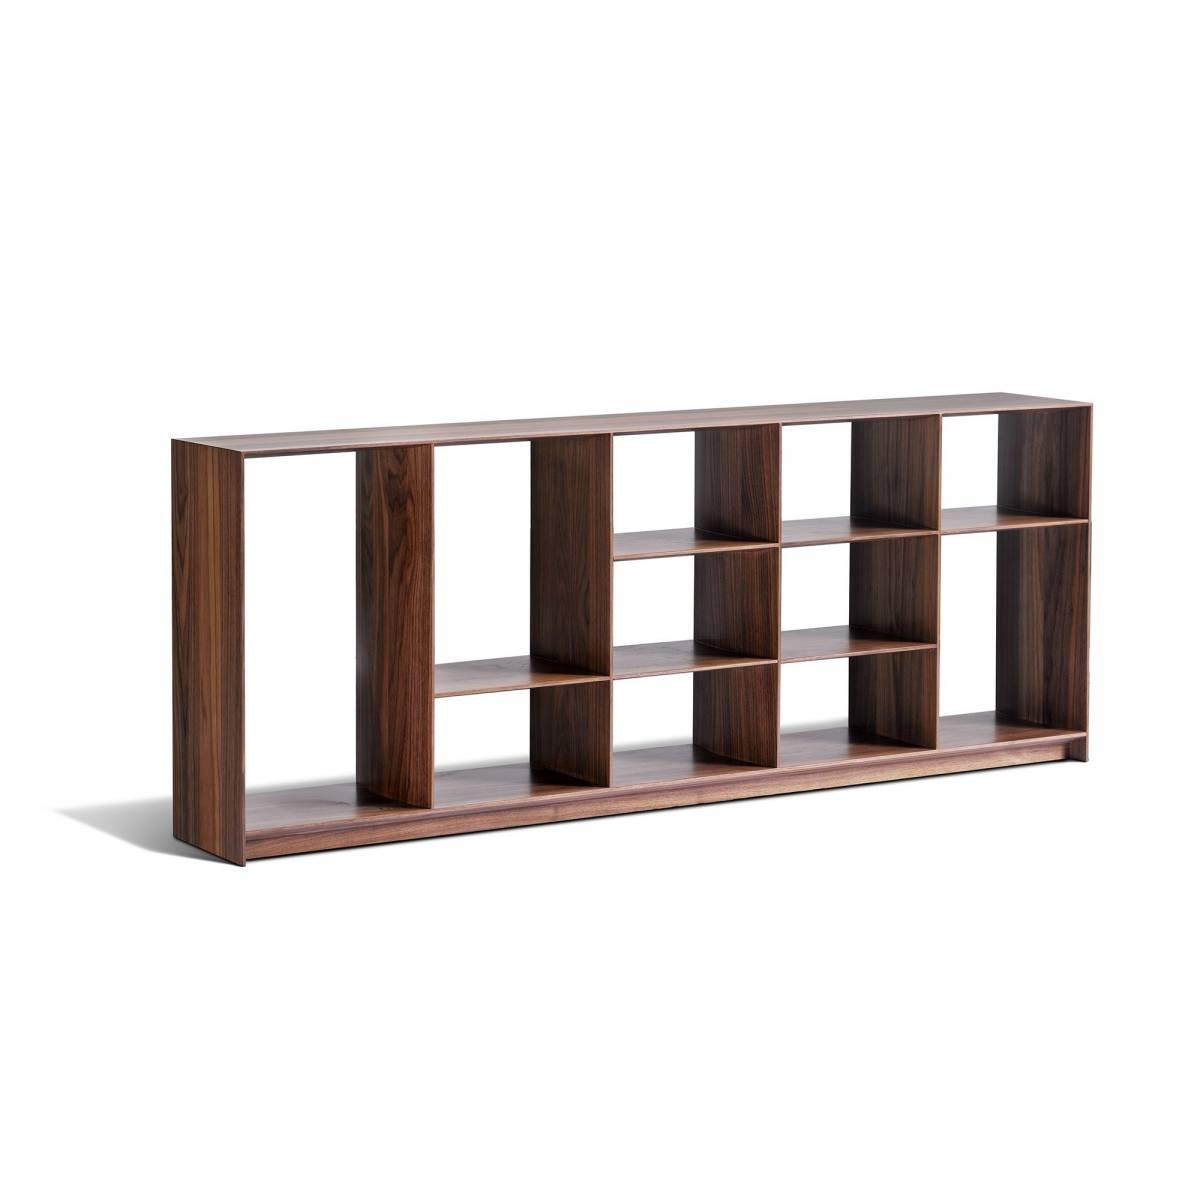 Uncategorized Horizontal Bookshelf